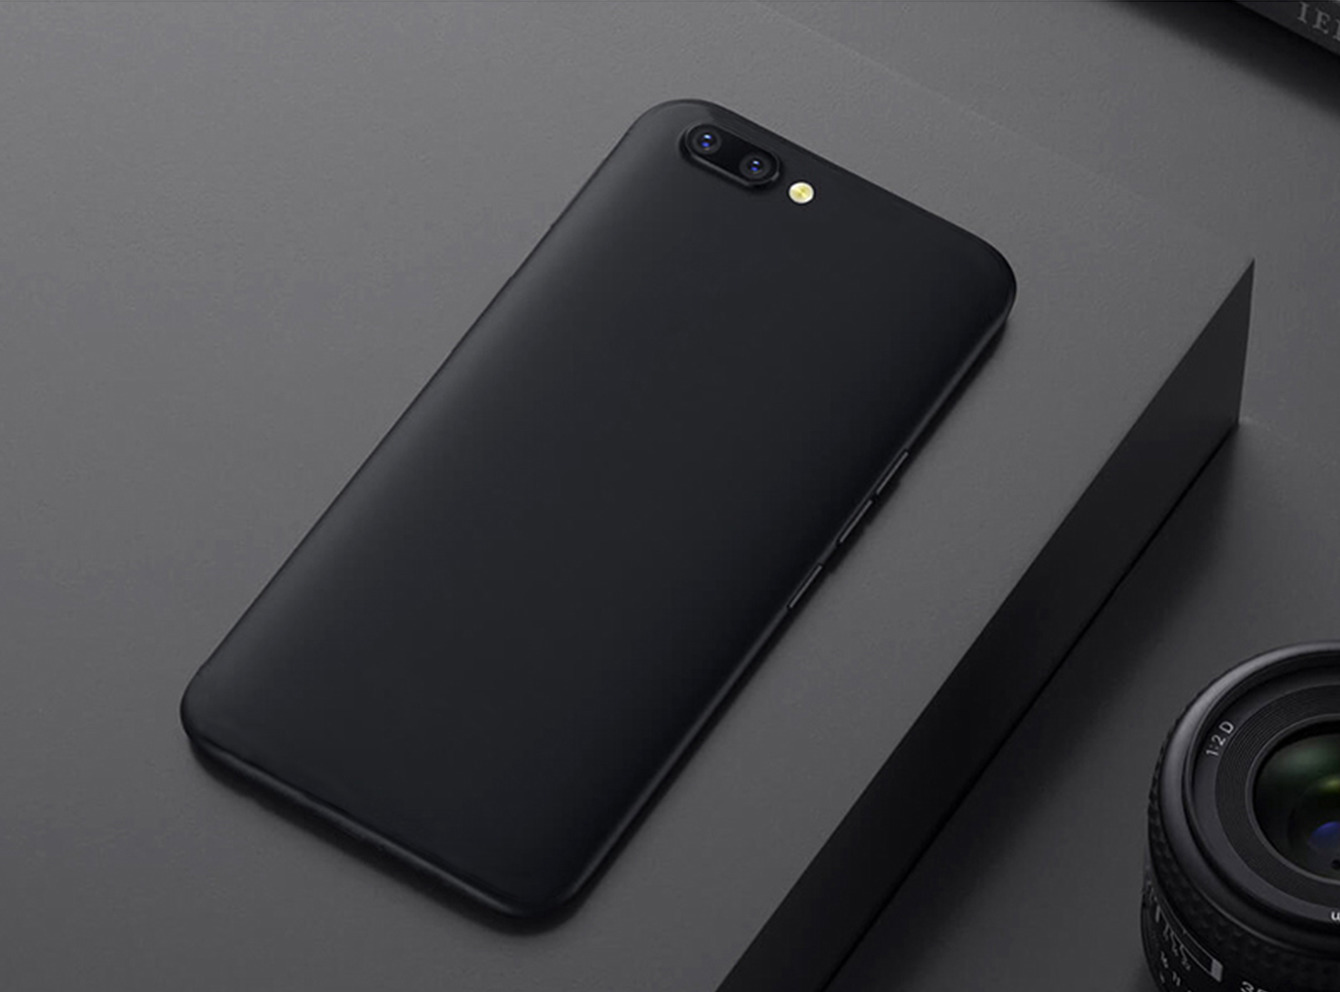 Brand New Fingerprint R1s Full Cnc 4g Mobile Phone Intelligence 5.5 Inch Face Quality Goods Unlocking Macro Family Student Will Screen